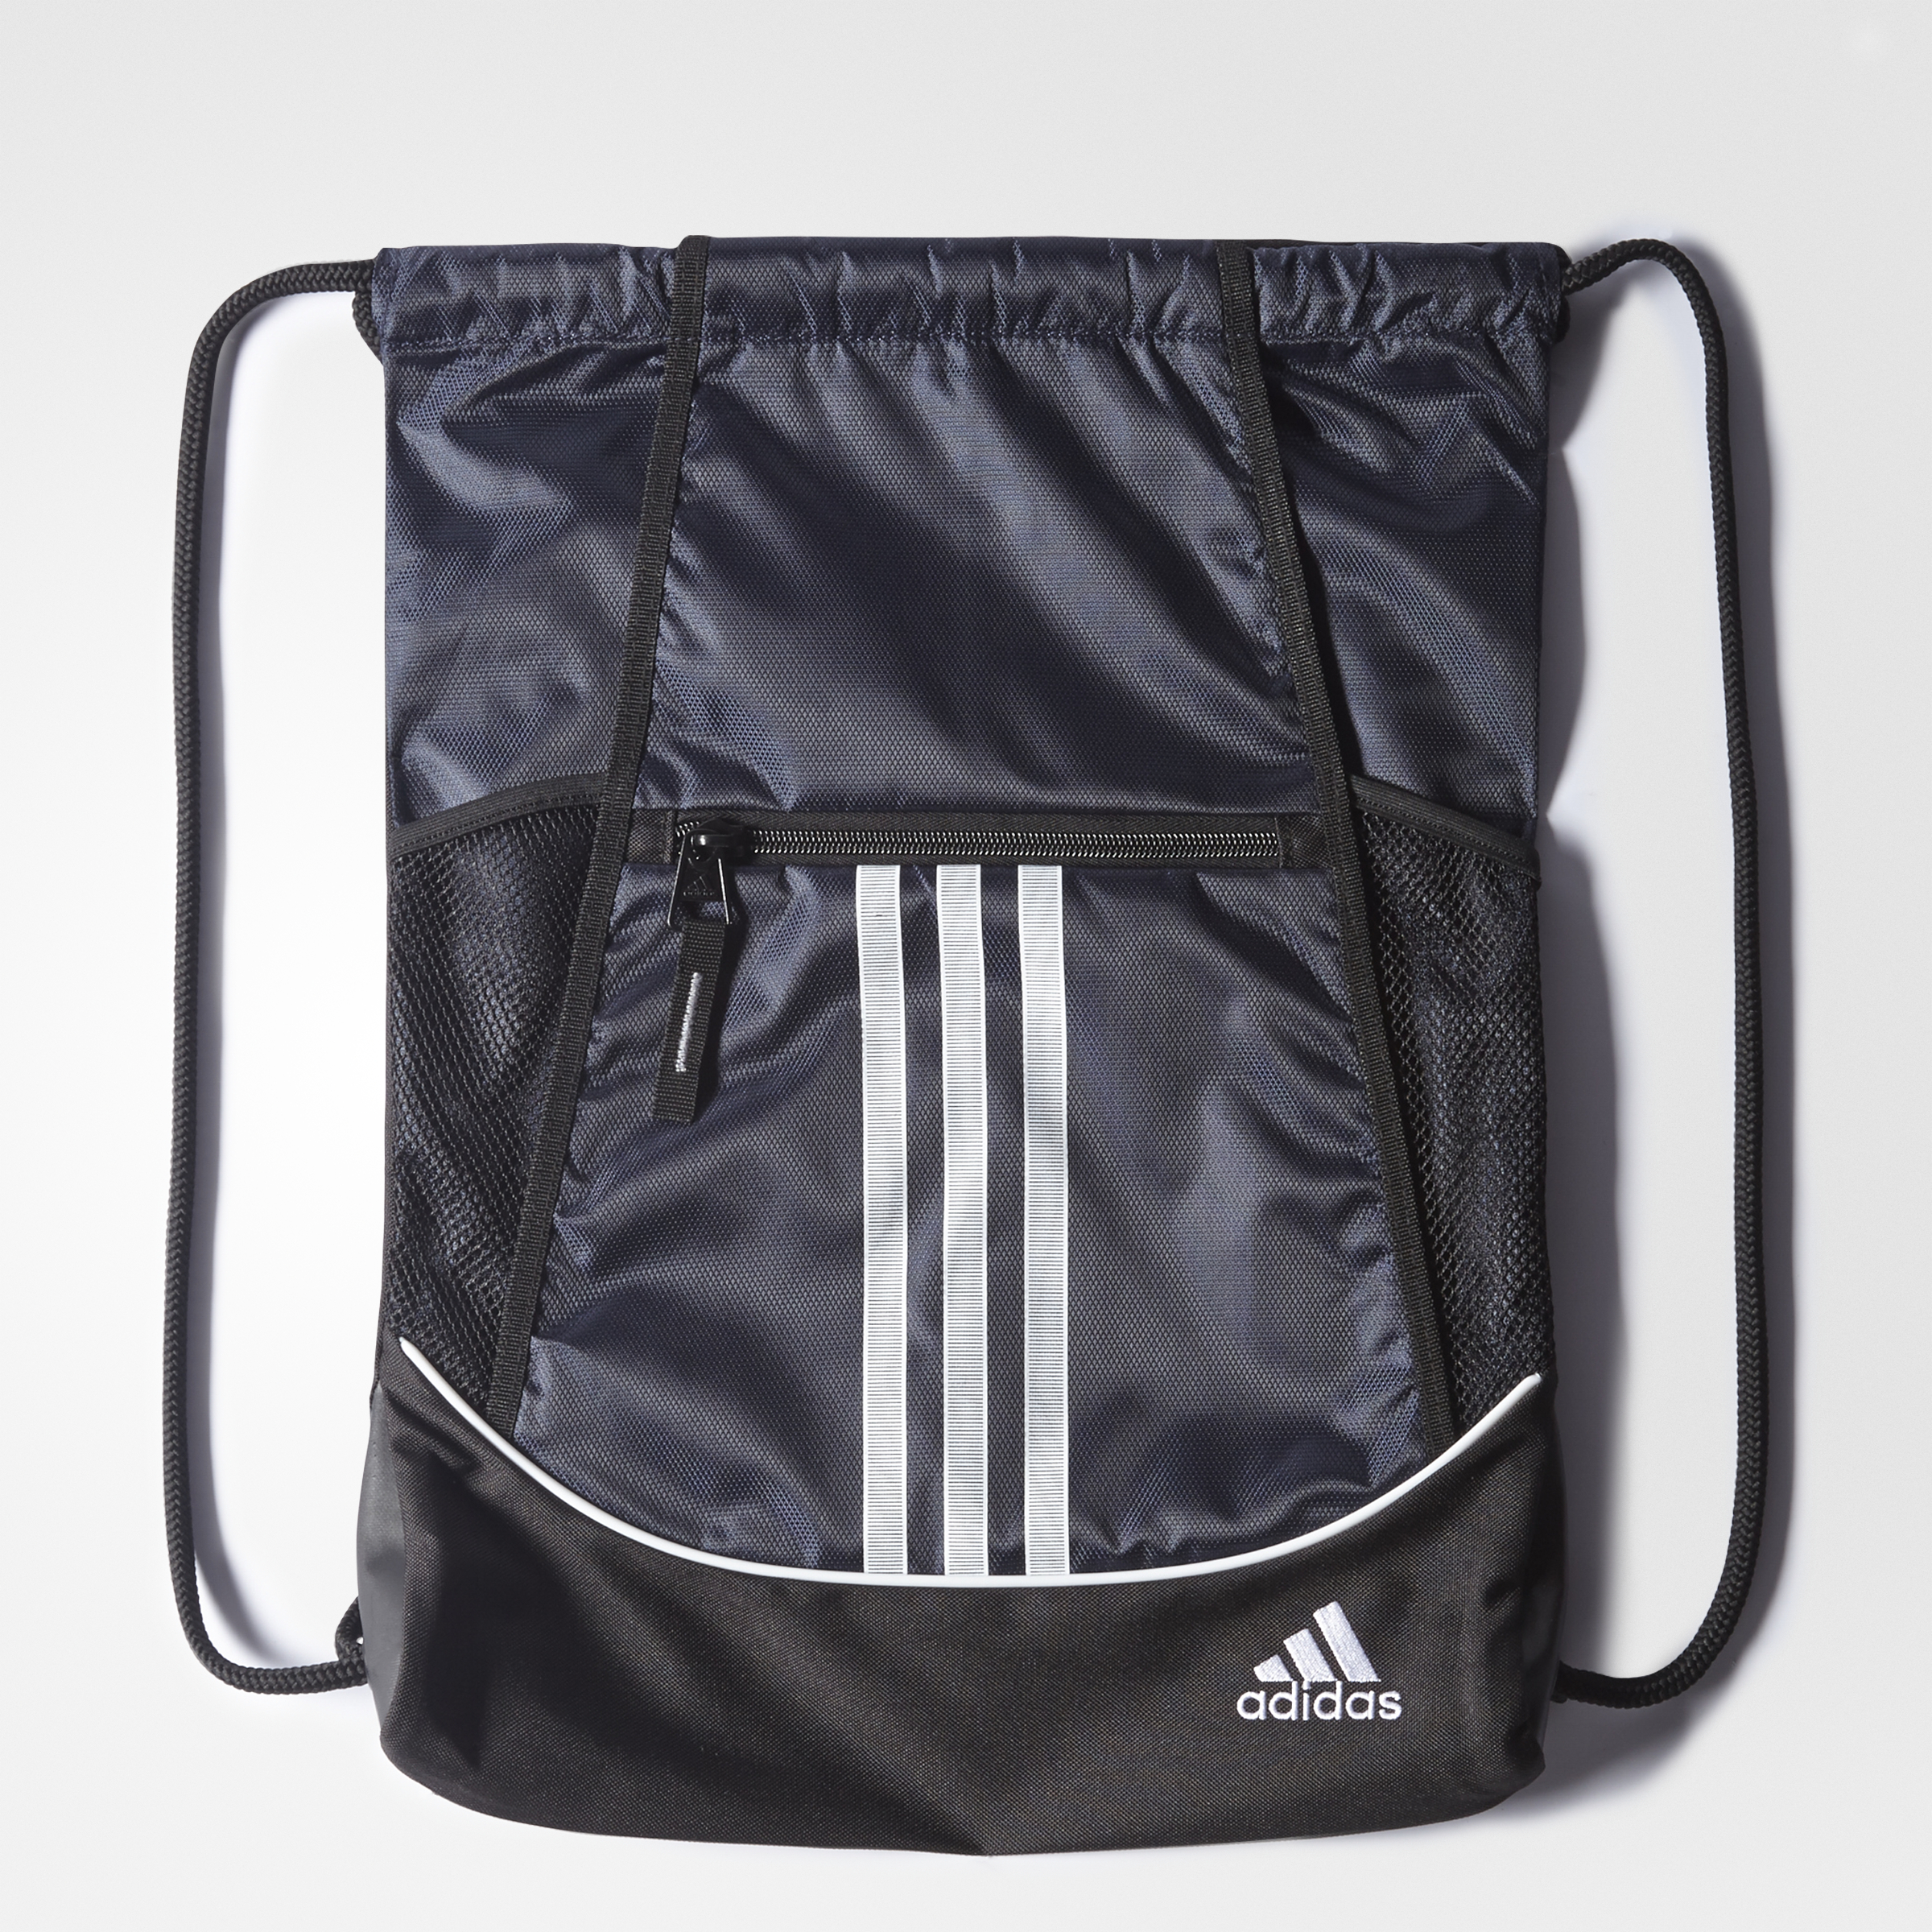 adidas-Lightning-Sackpack-Bags miniature 9